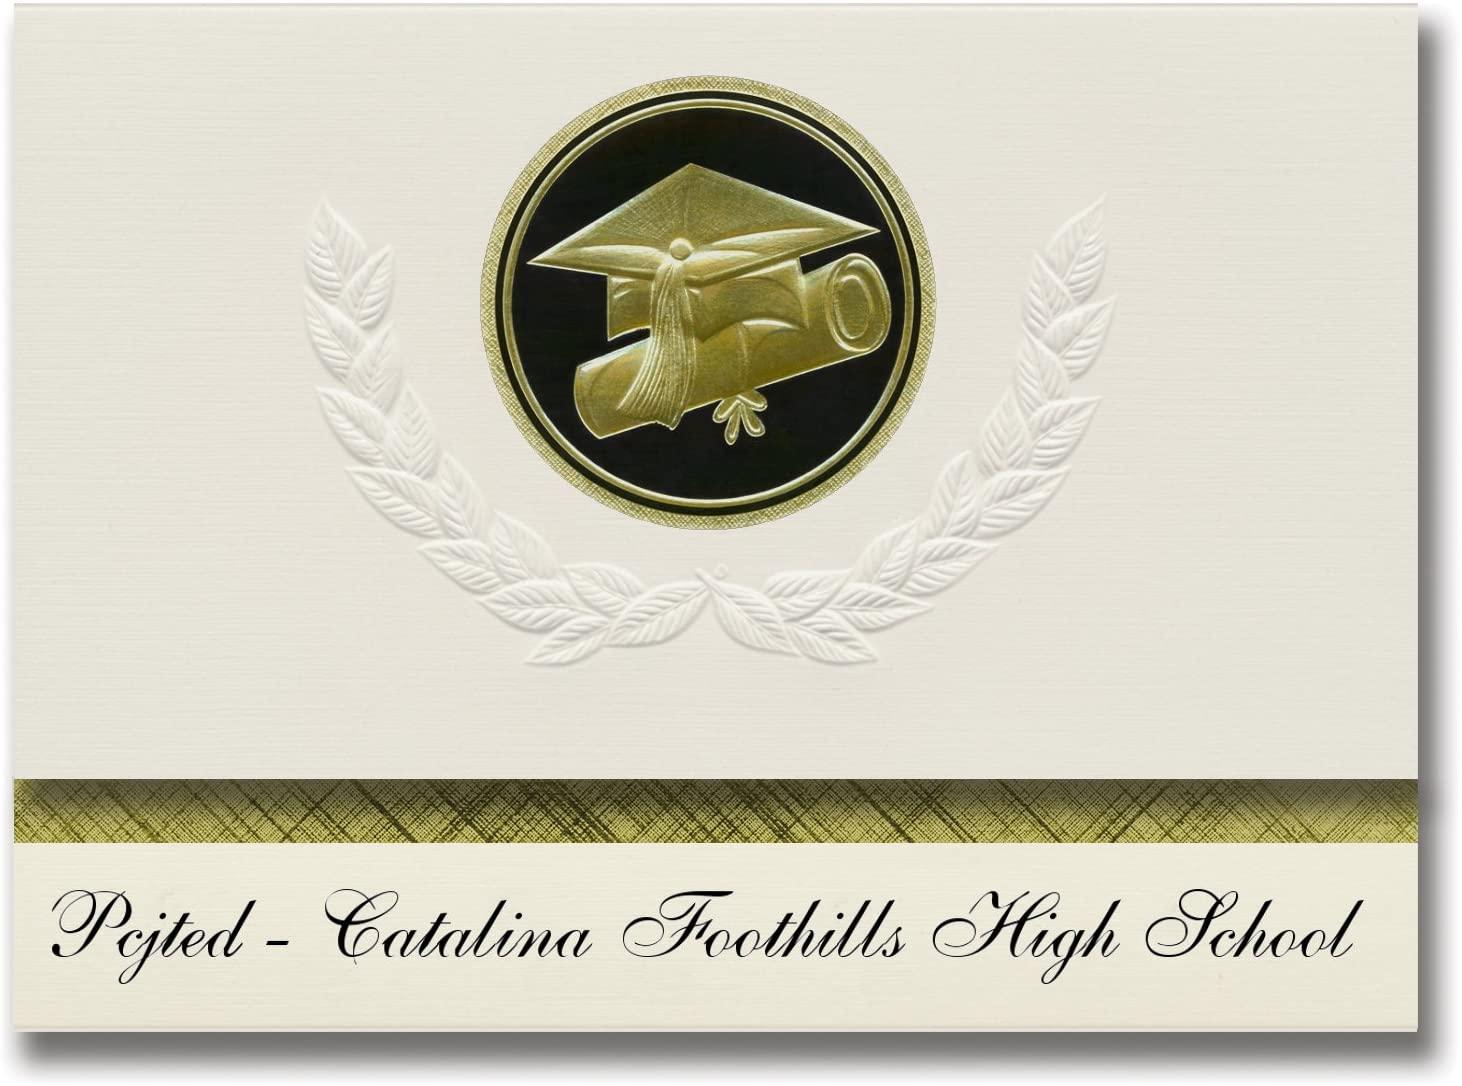 Signature Announcements Pcjted - Catalina Foothills High School (Tucson, AZ) Graduation Announcements, Presidential Elite Pack 25 Cap & Diploma Seal. Black & Gold.